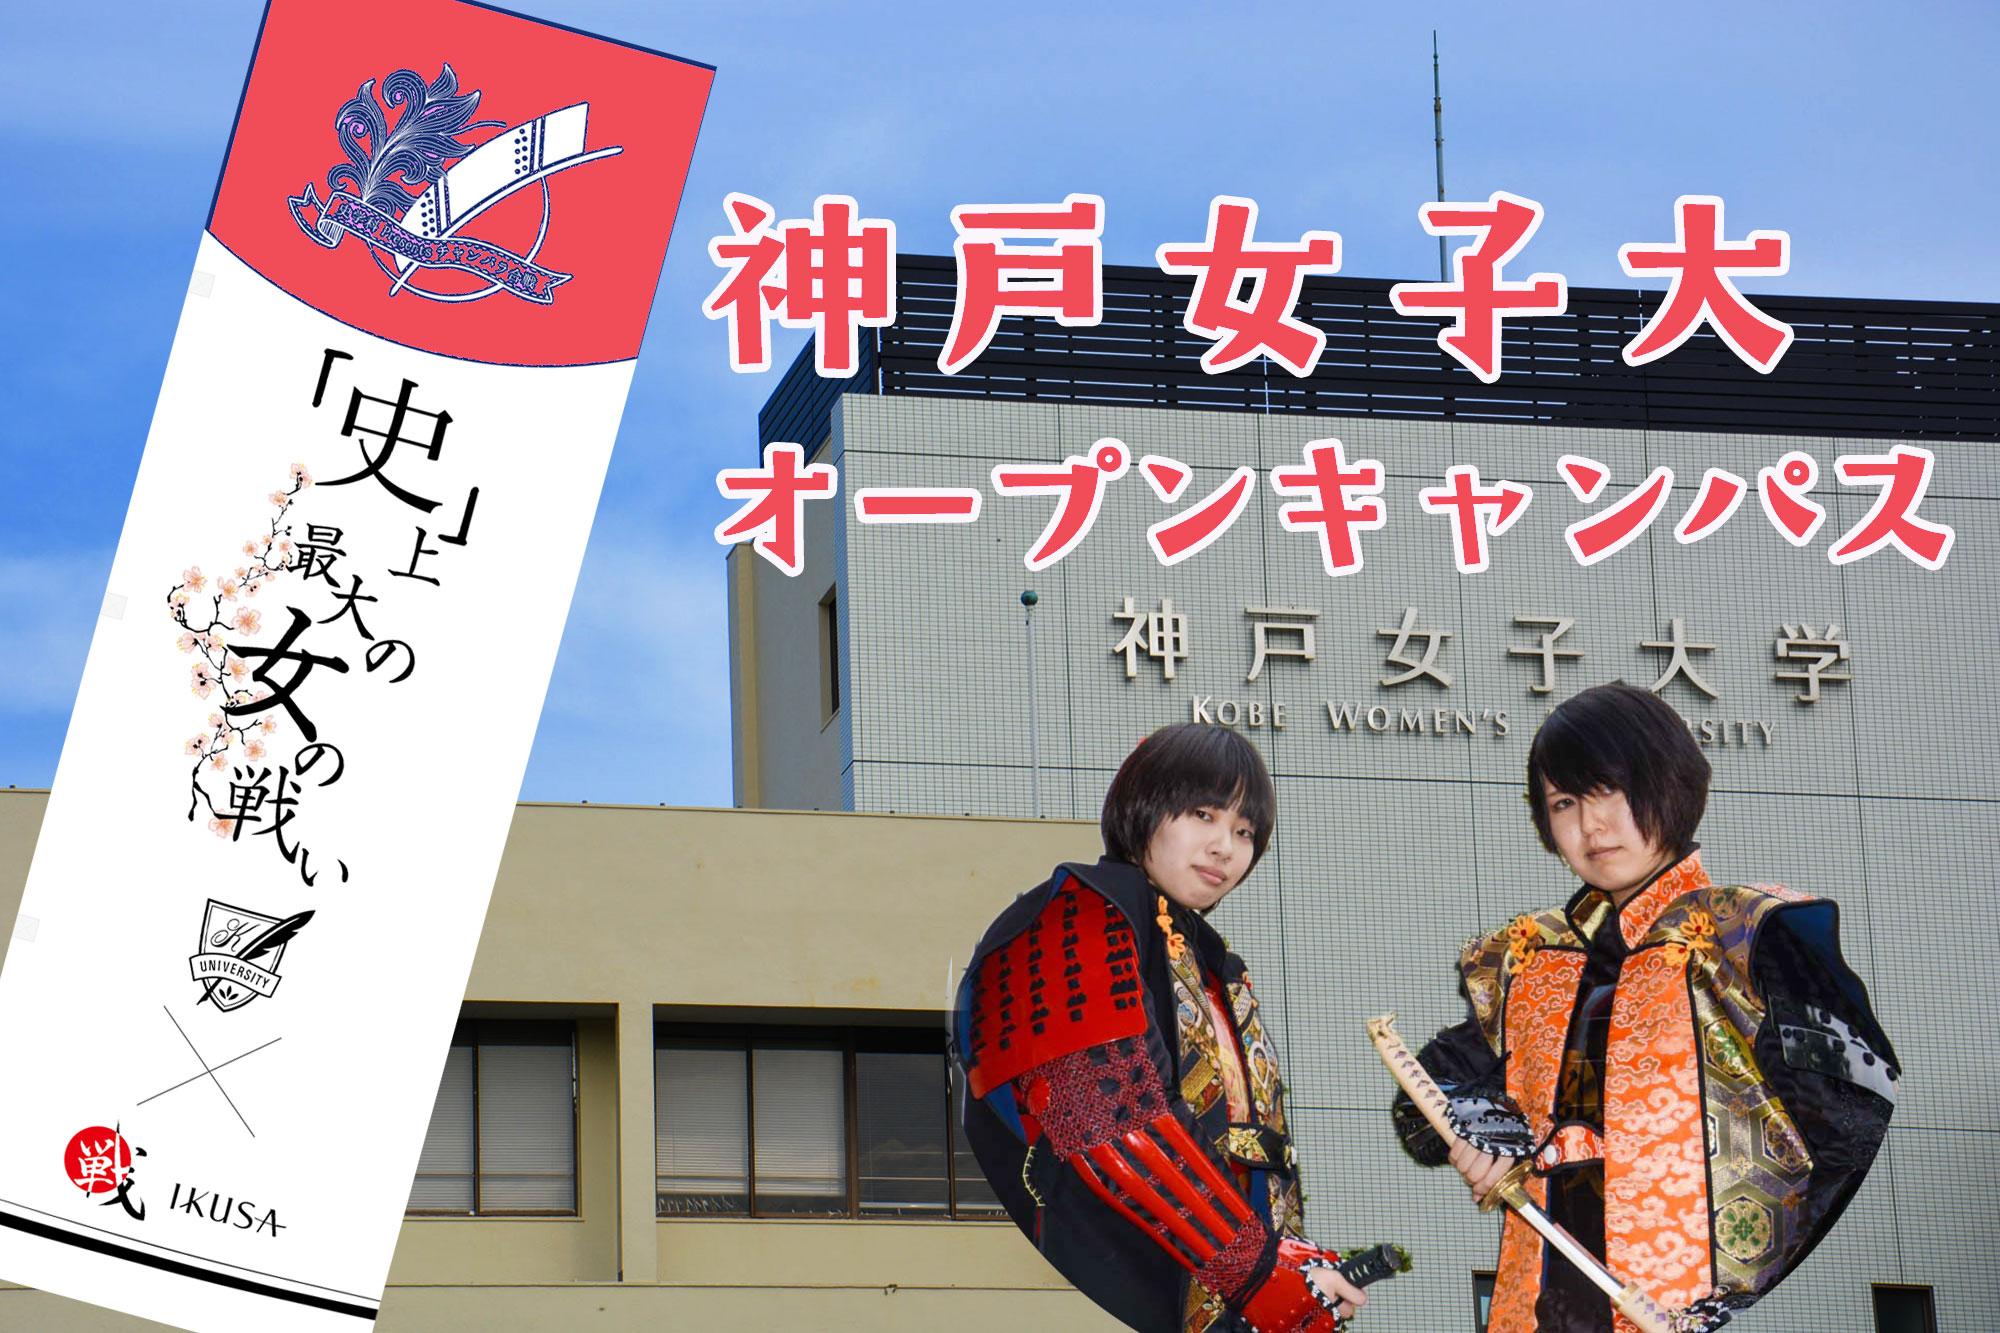 kobejoshi0905-18 (1)